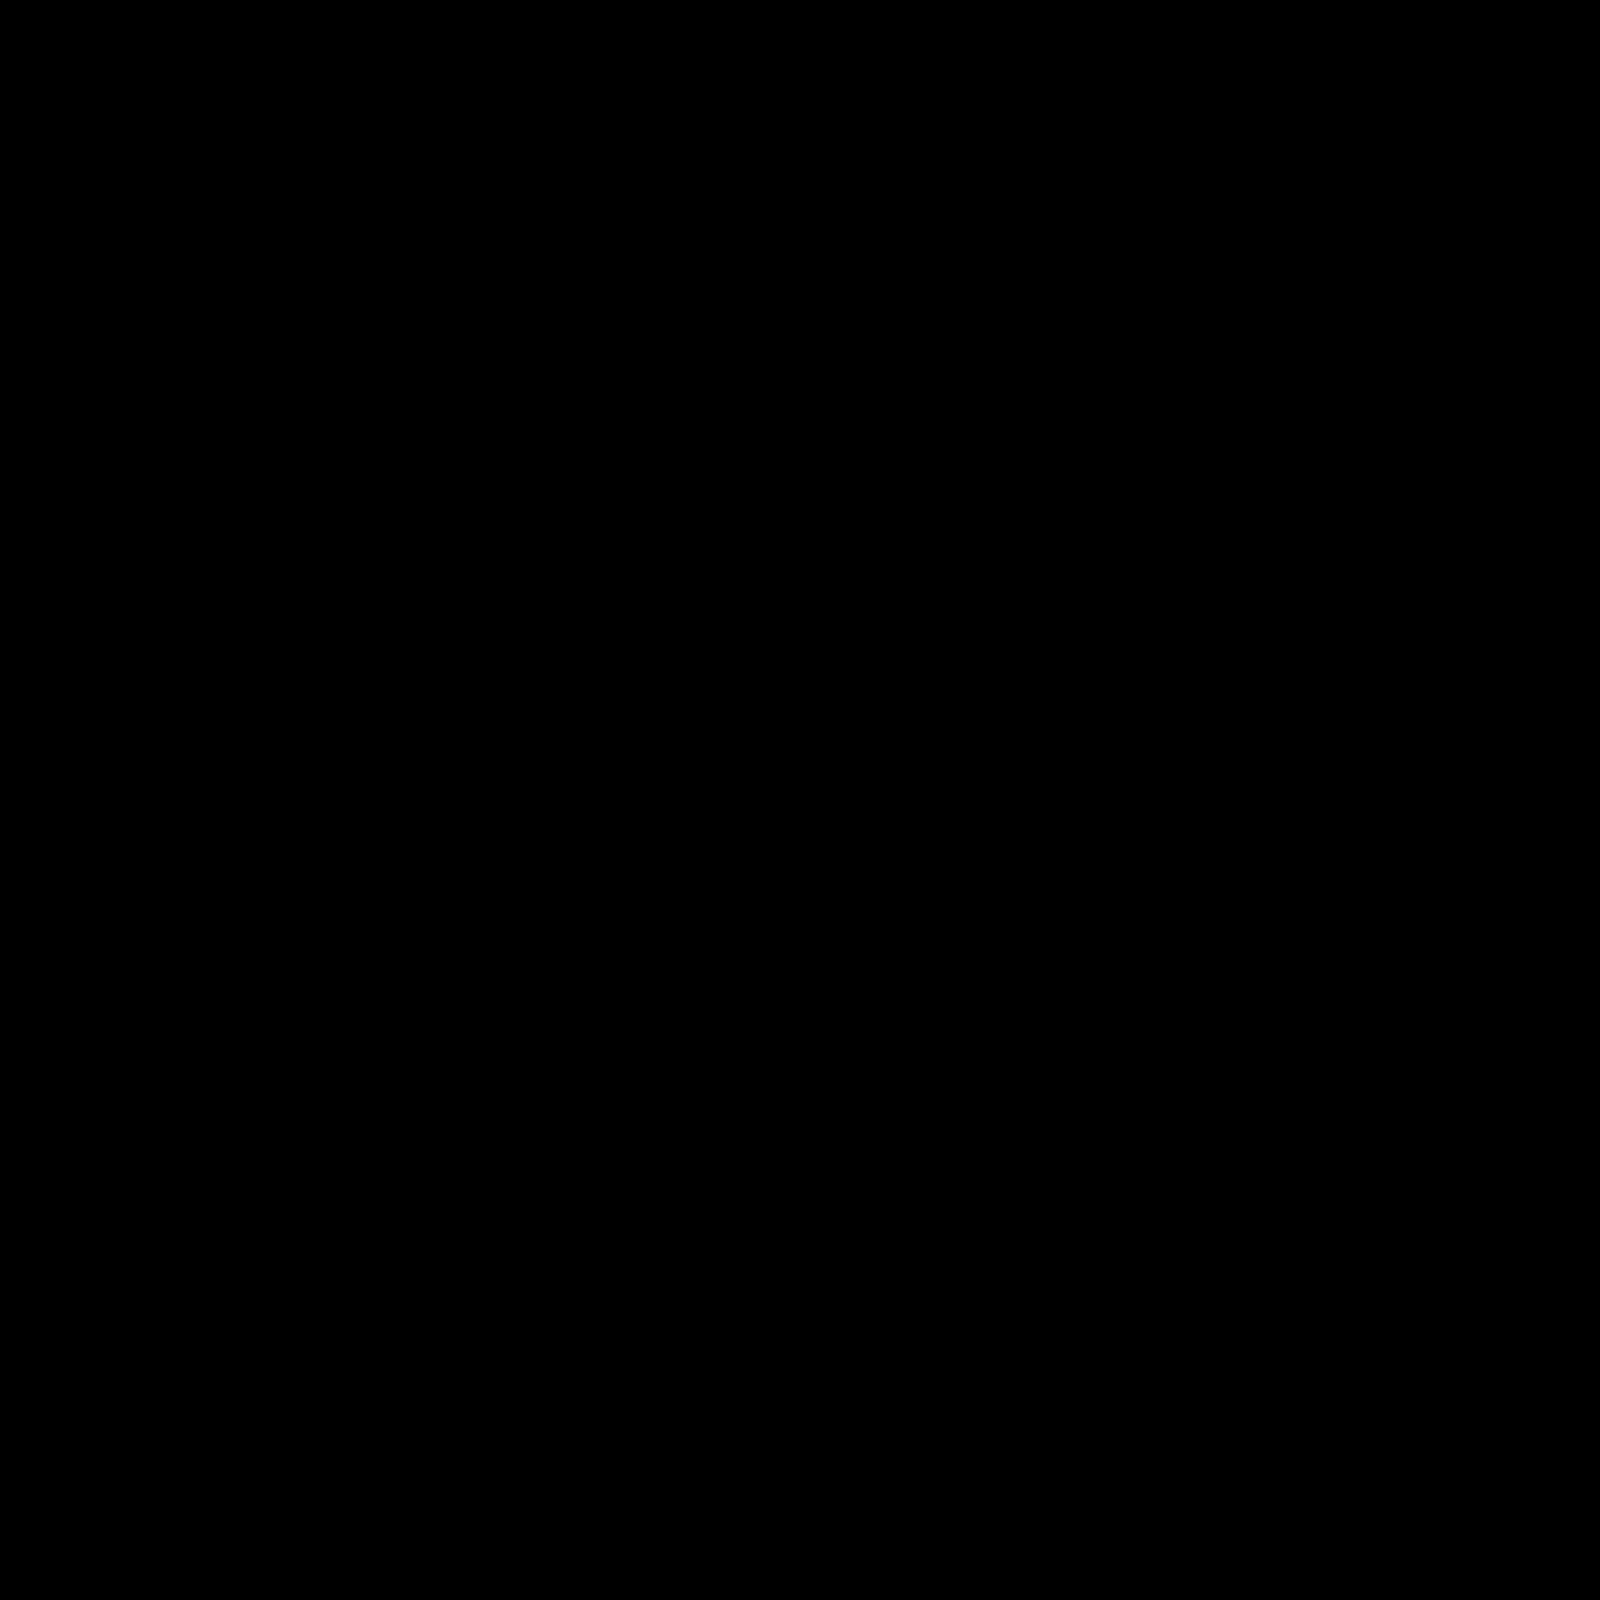 Viber PNG - 37856